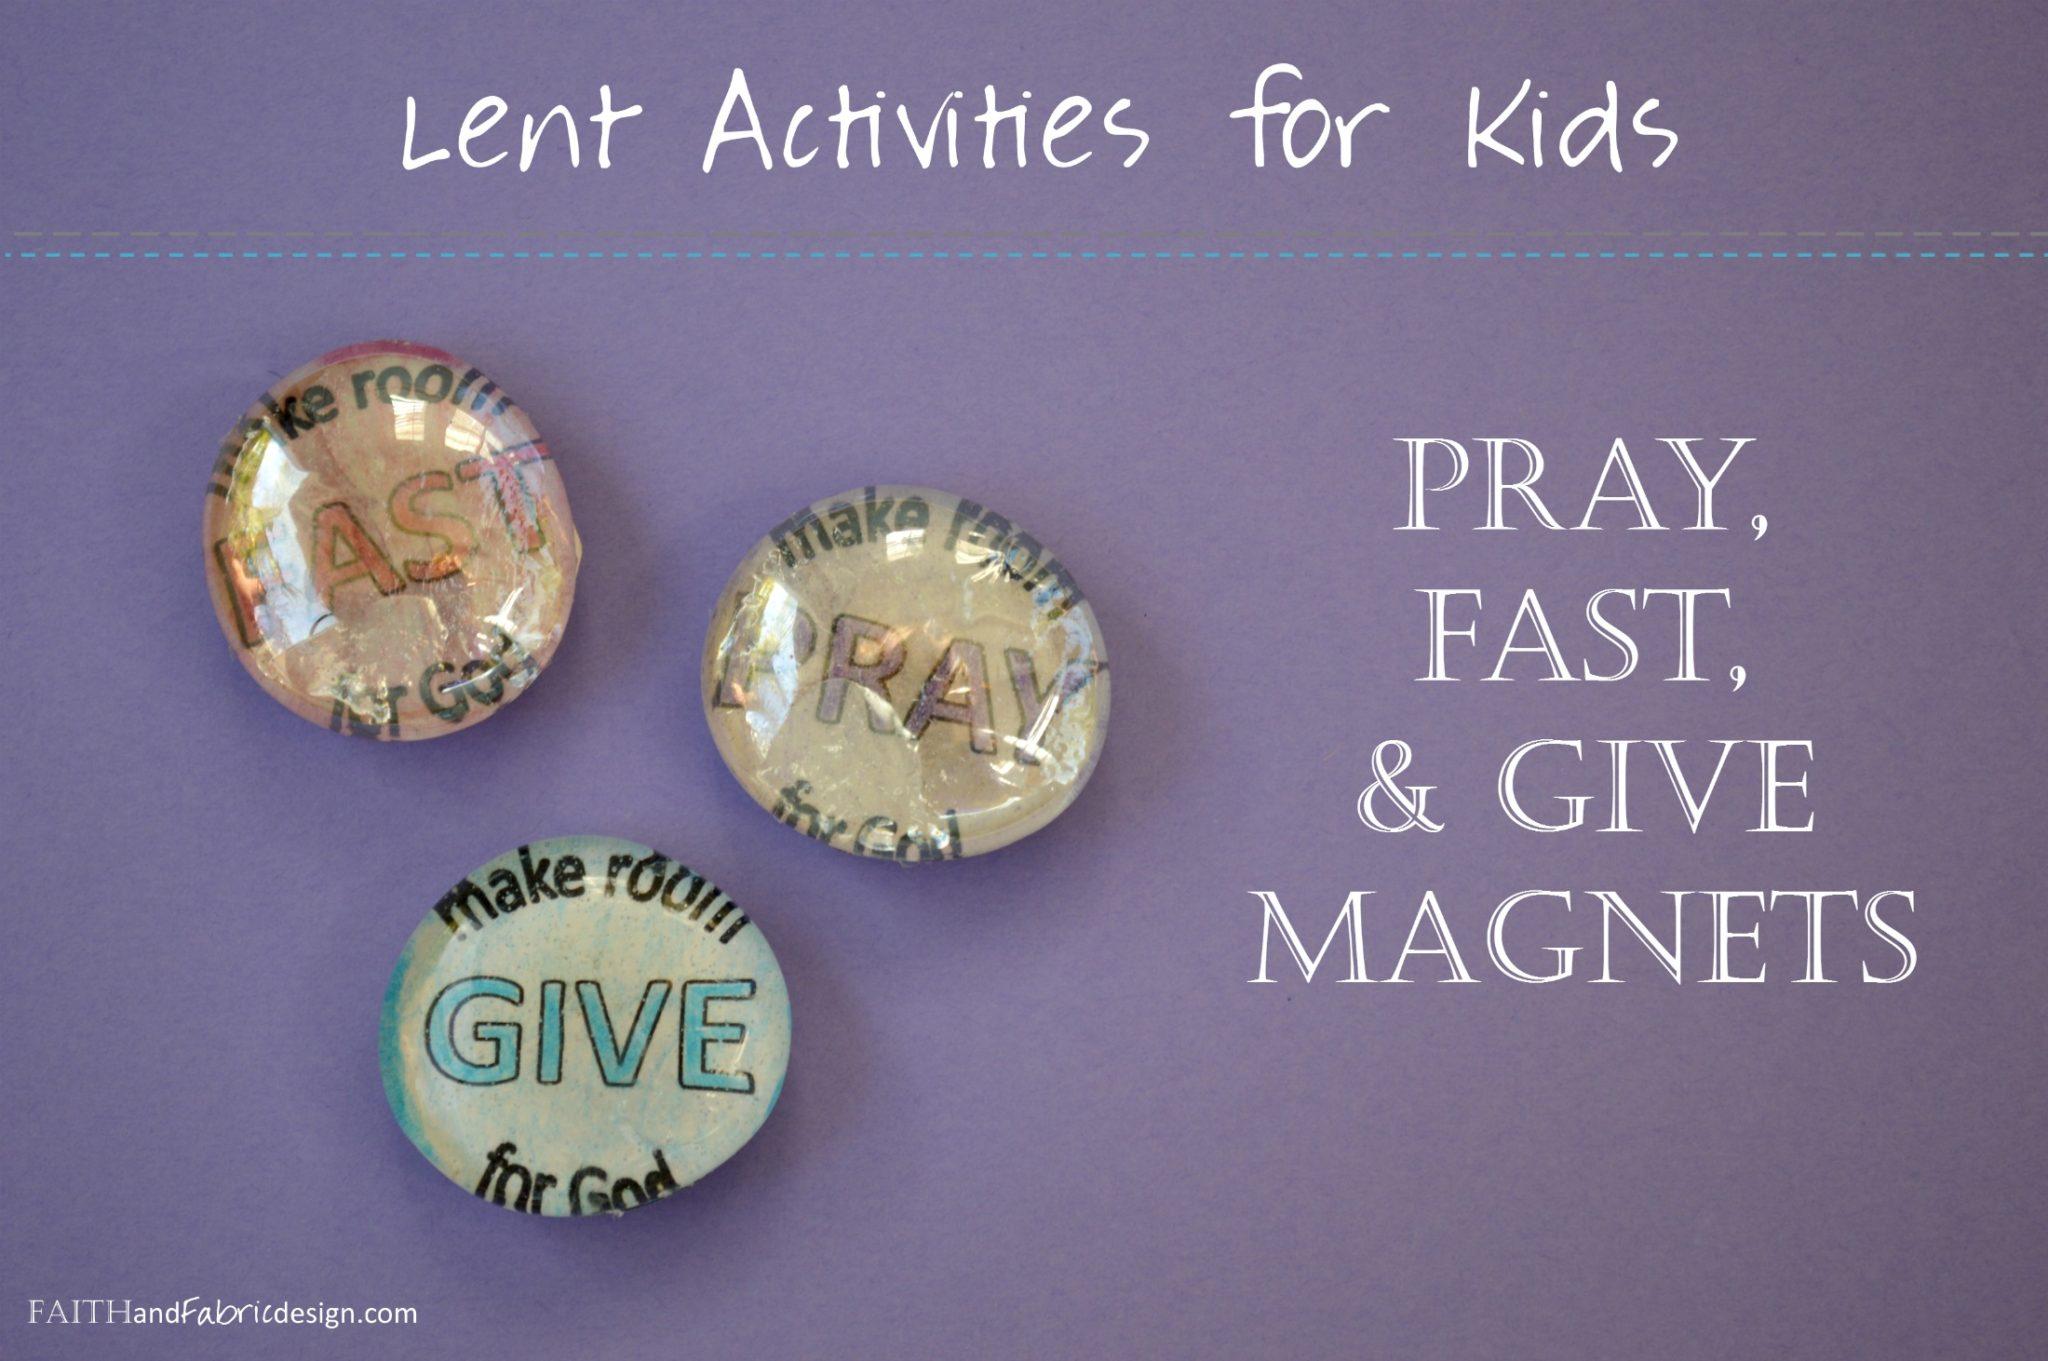 Activity Make Room For God Lent Activity Stones Faith And Fabric